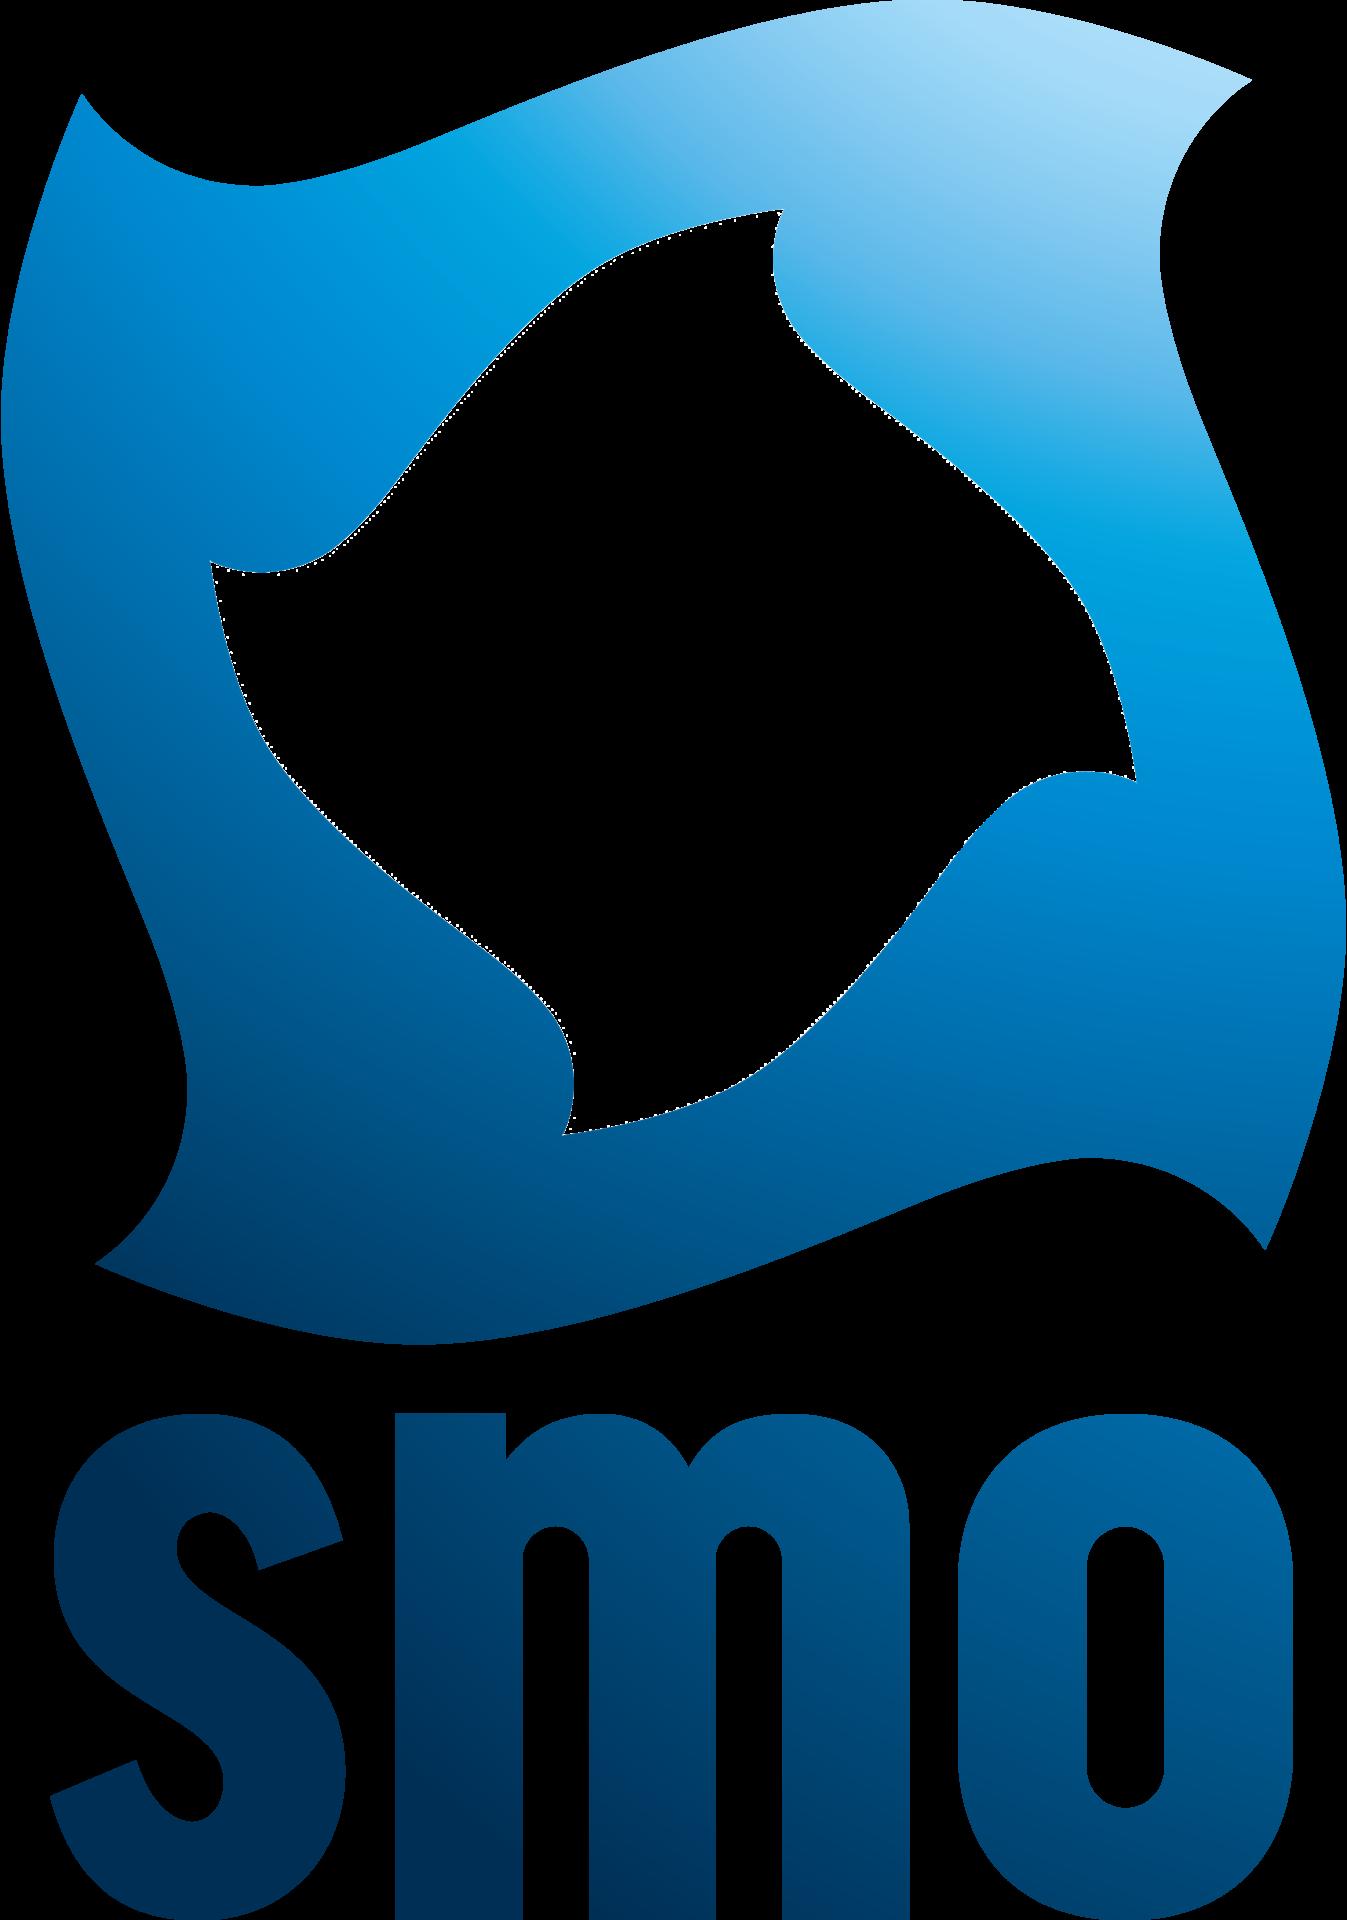 SMO-logo-png-12